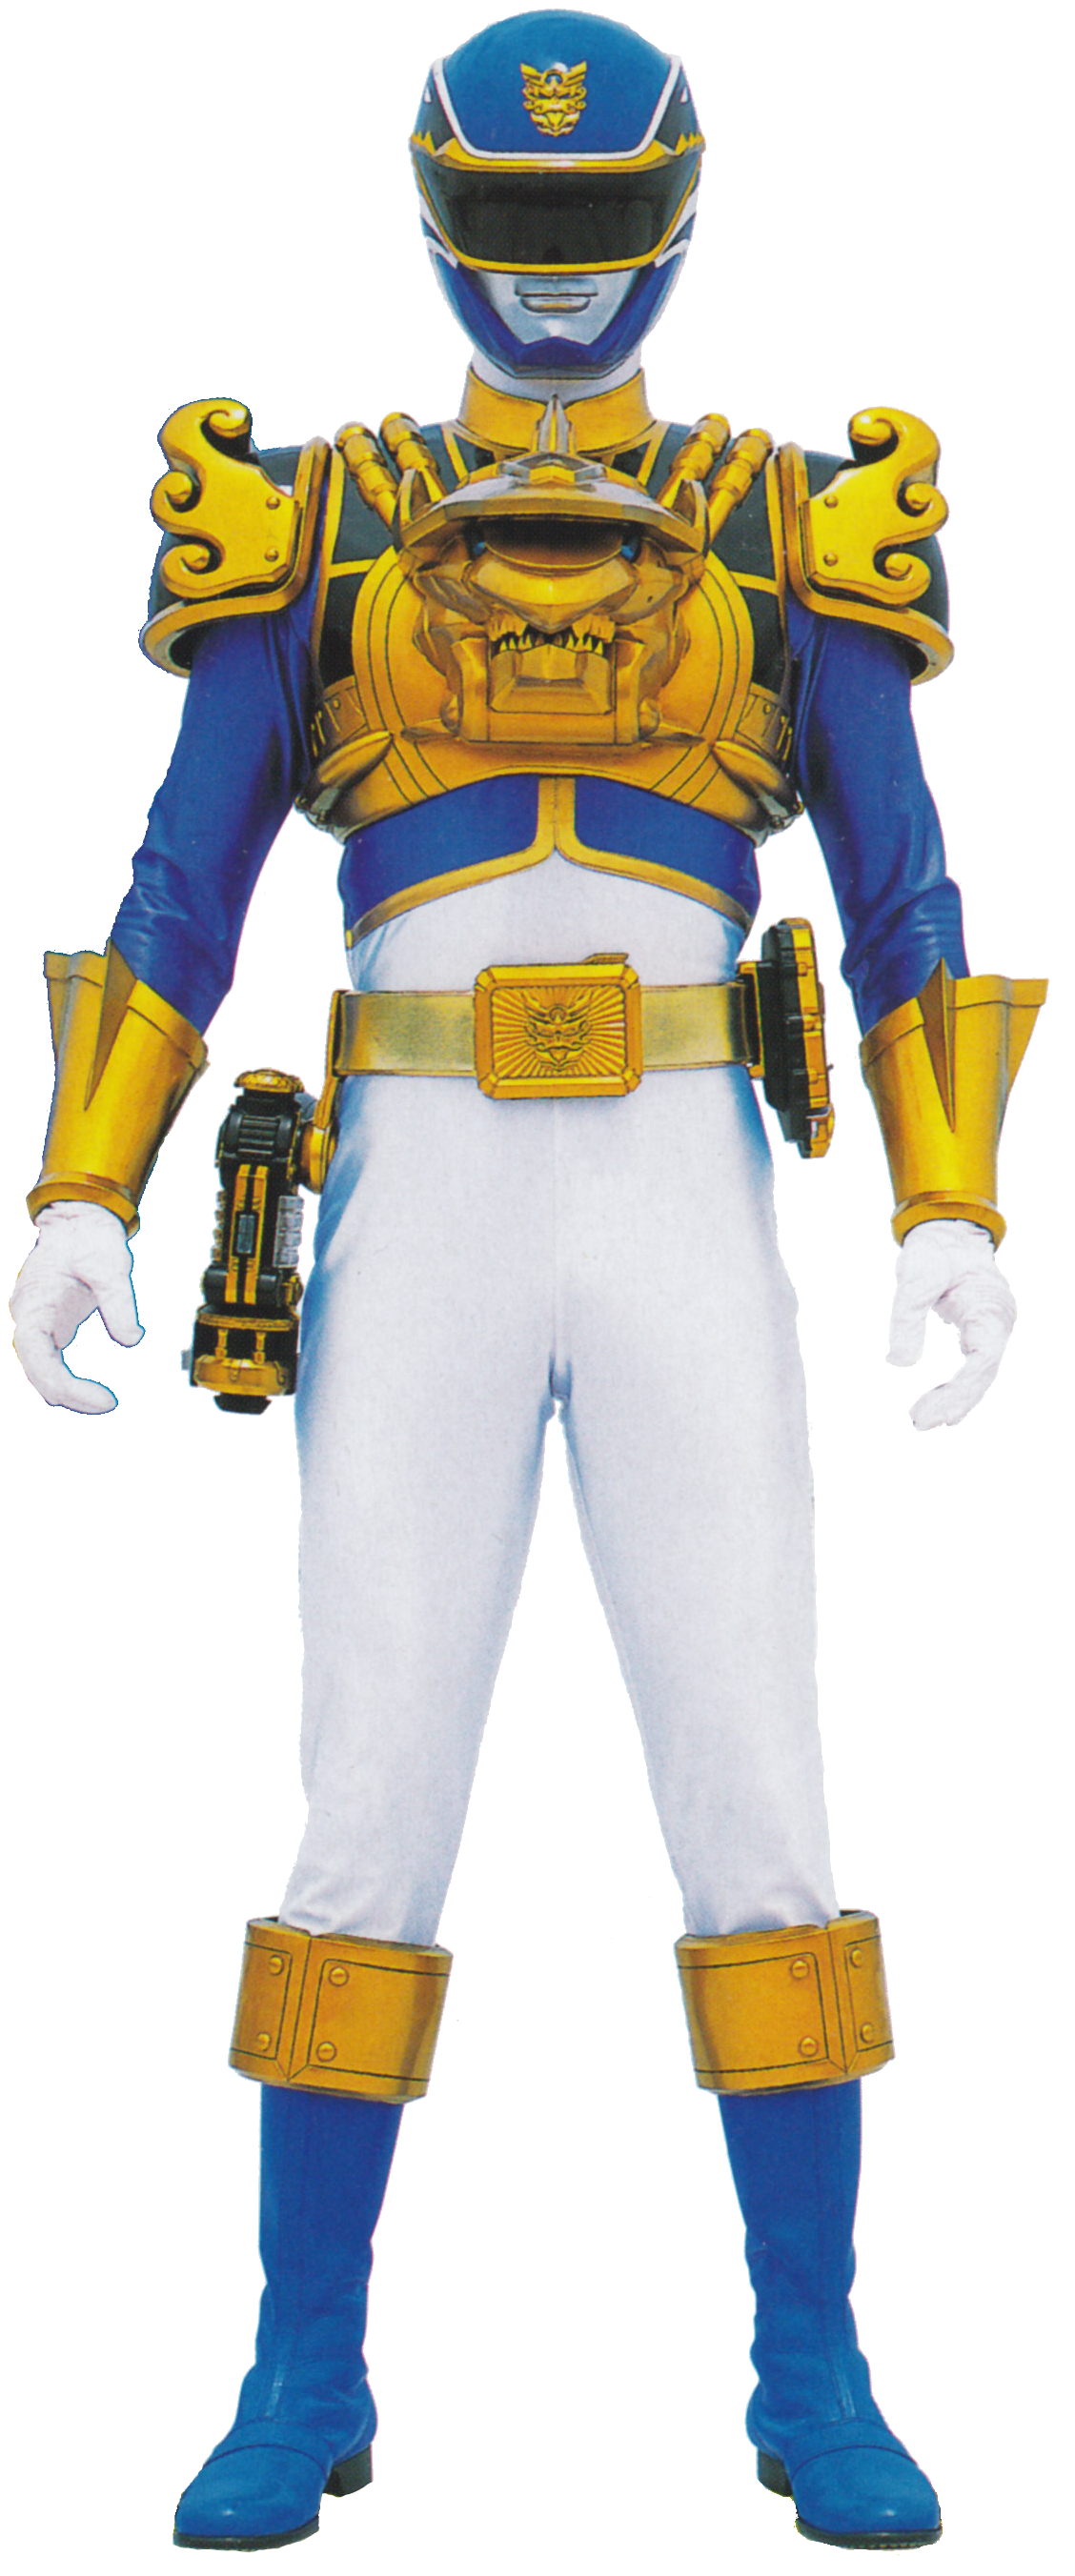 Image - Ultra Blue Ranger (Power Rangers Megaforce).png | Power ...